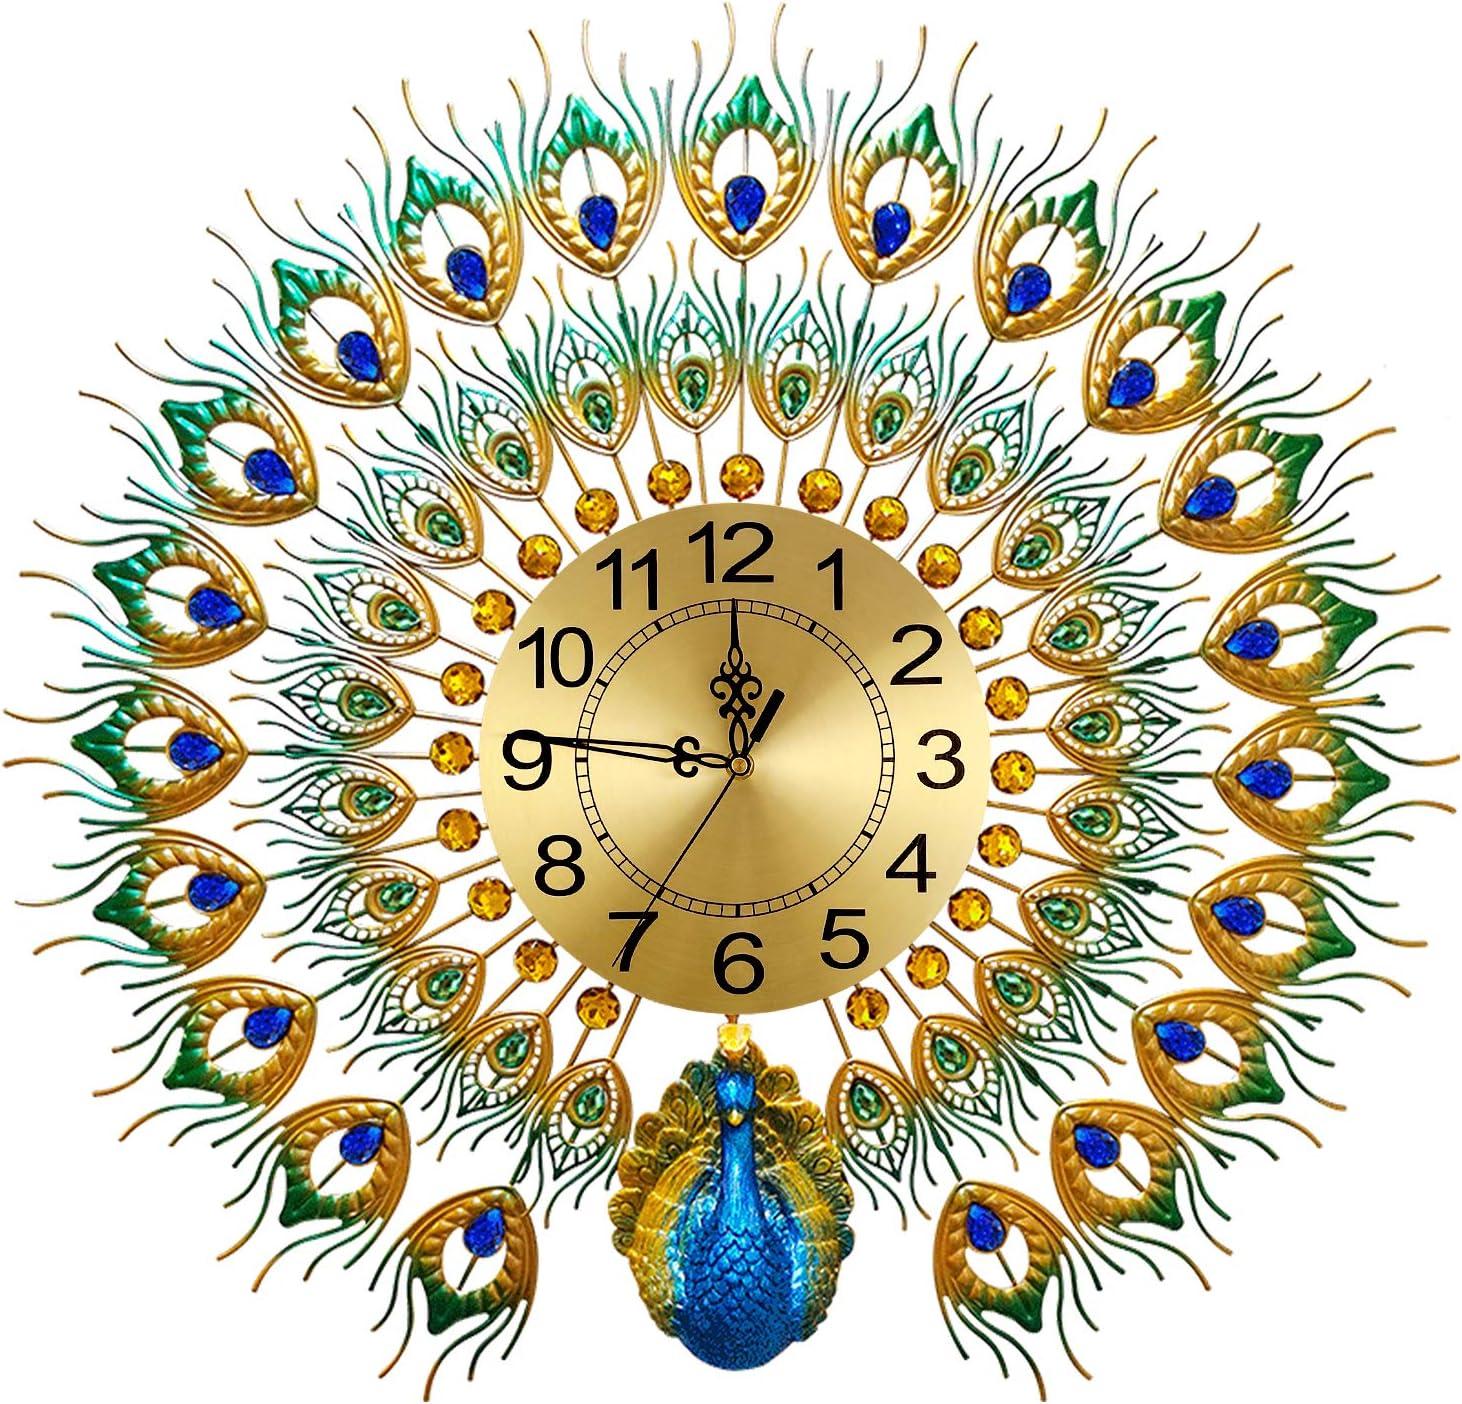 Large Peacock Wall Clock 27.6 Sale Design Non-Ticking inch Popular overseas Metal Sile